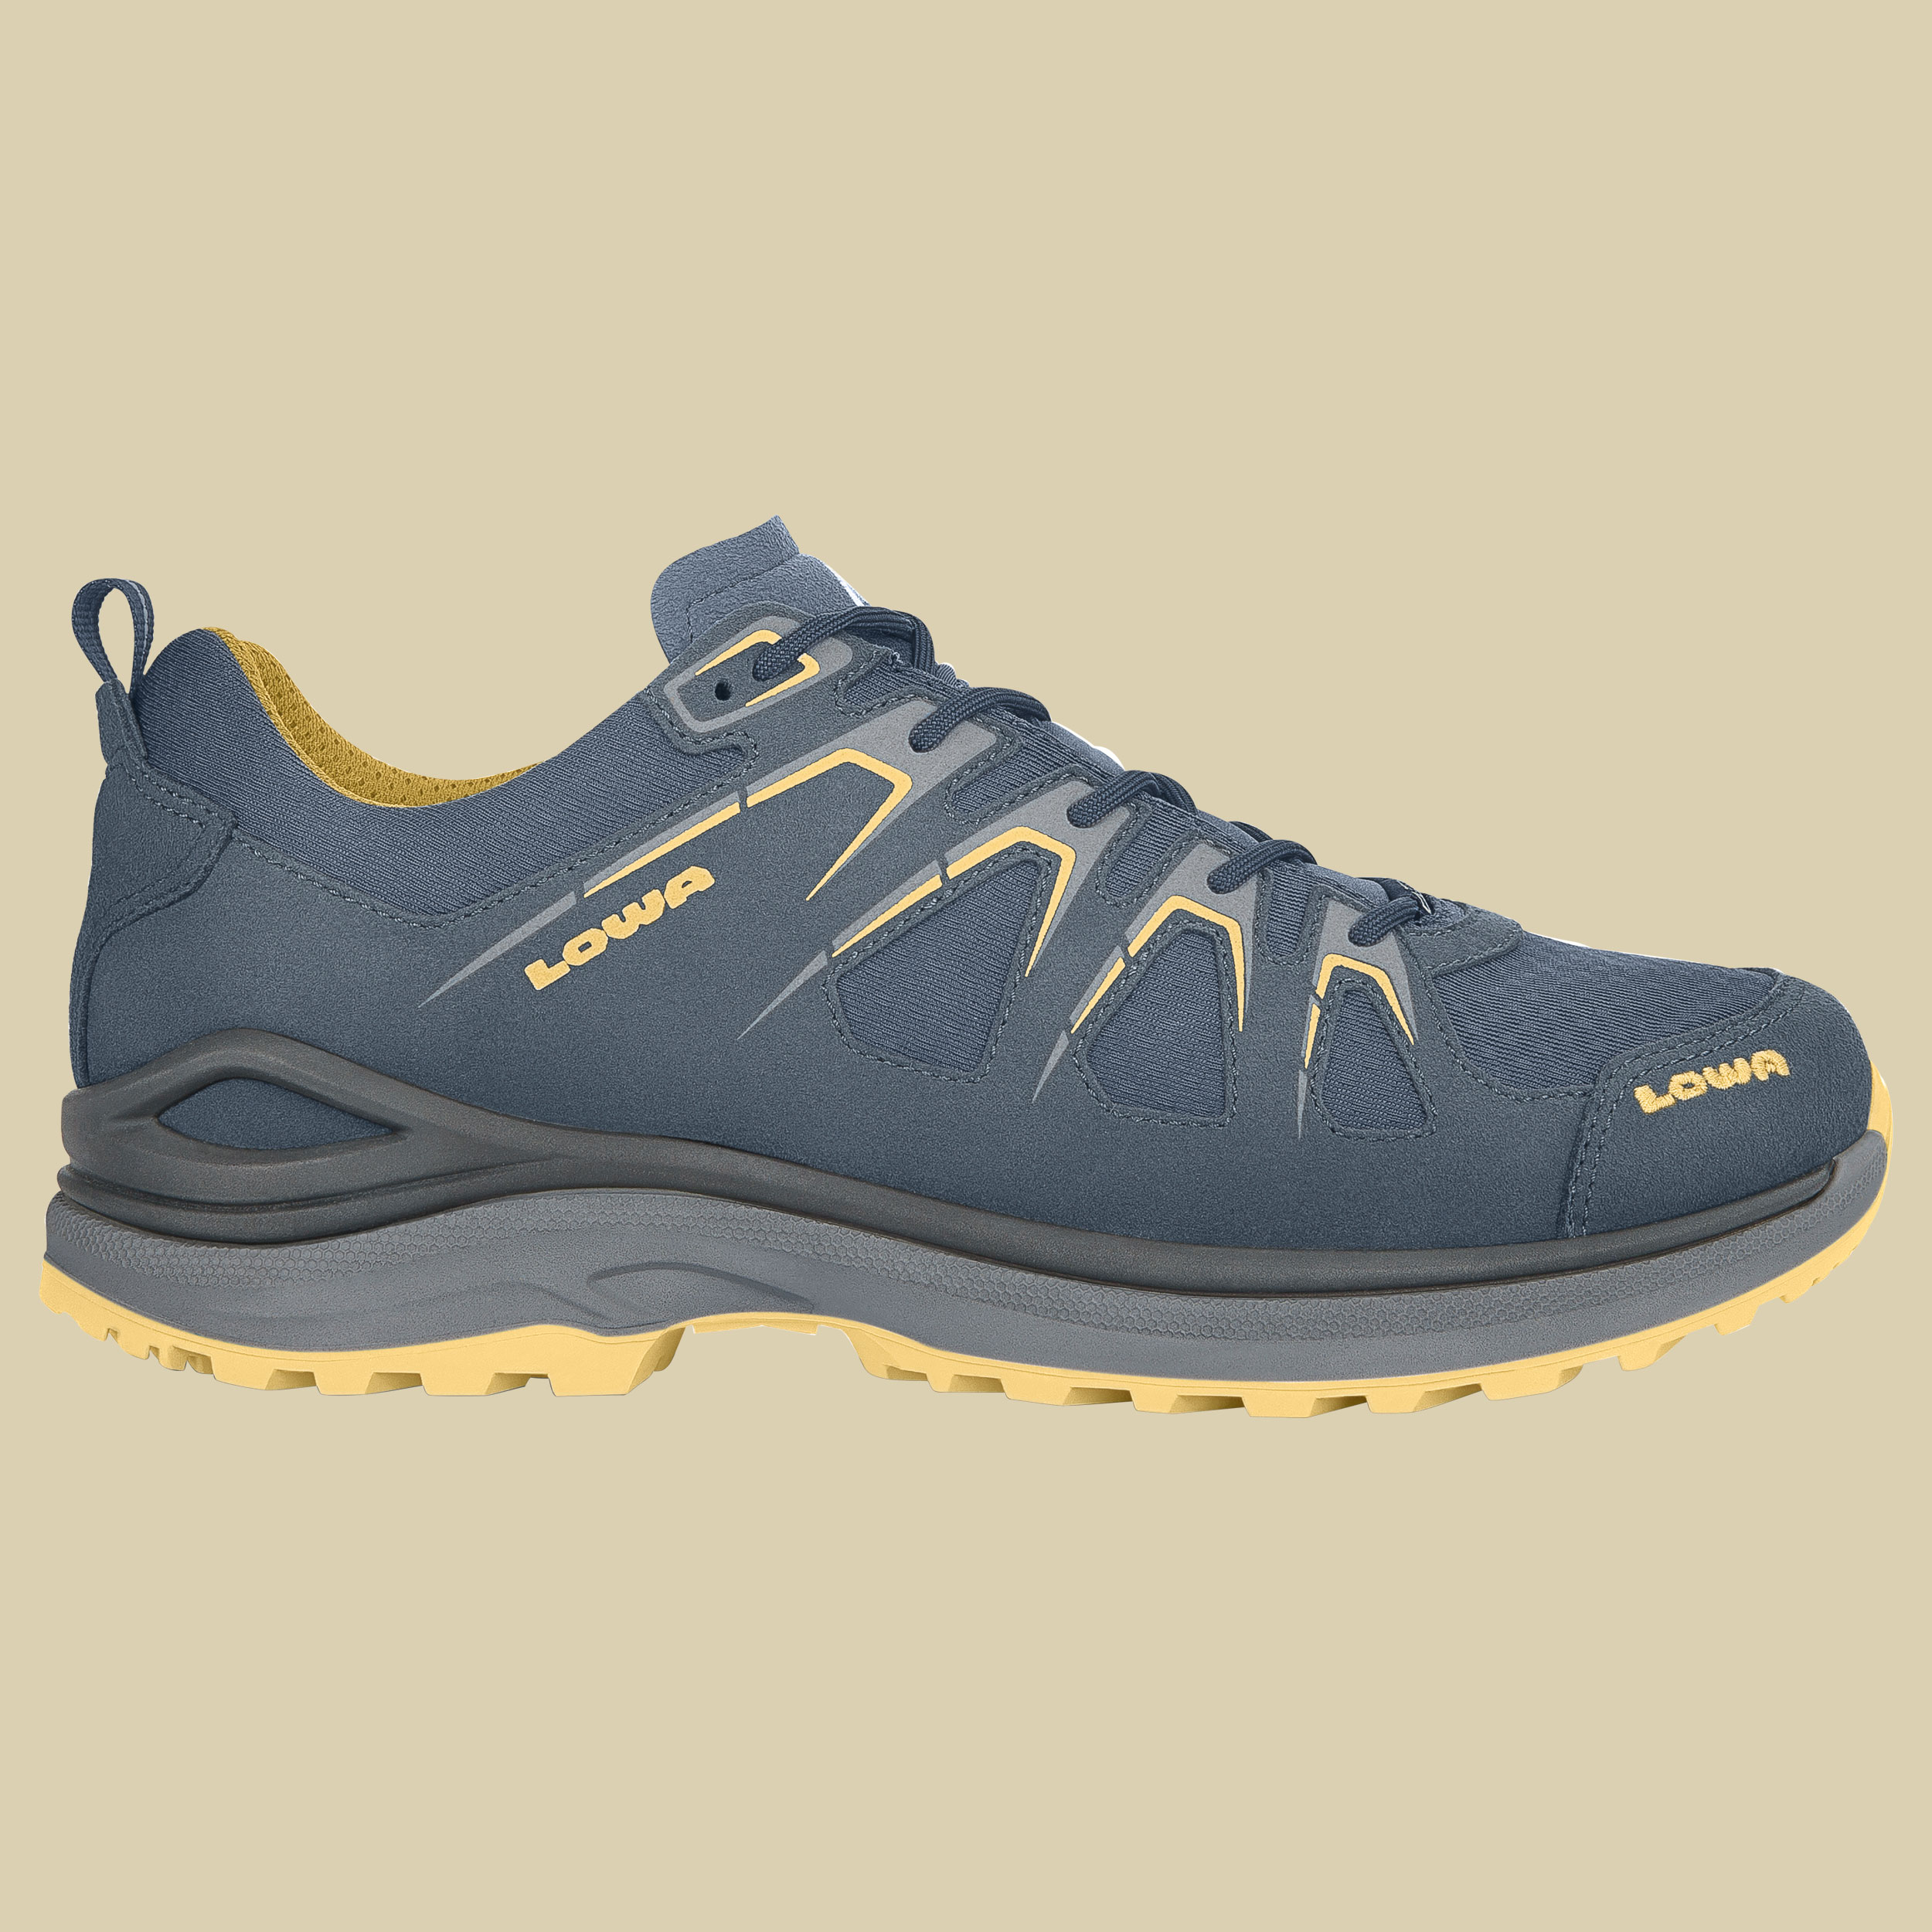 Lowa Innox Evo GTX Low Men Outdoor Fitness Schuh  Größe UK 8 stahlblau/senf